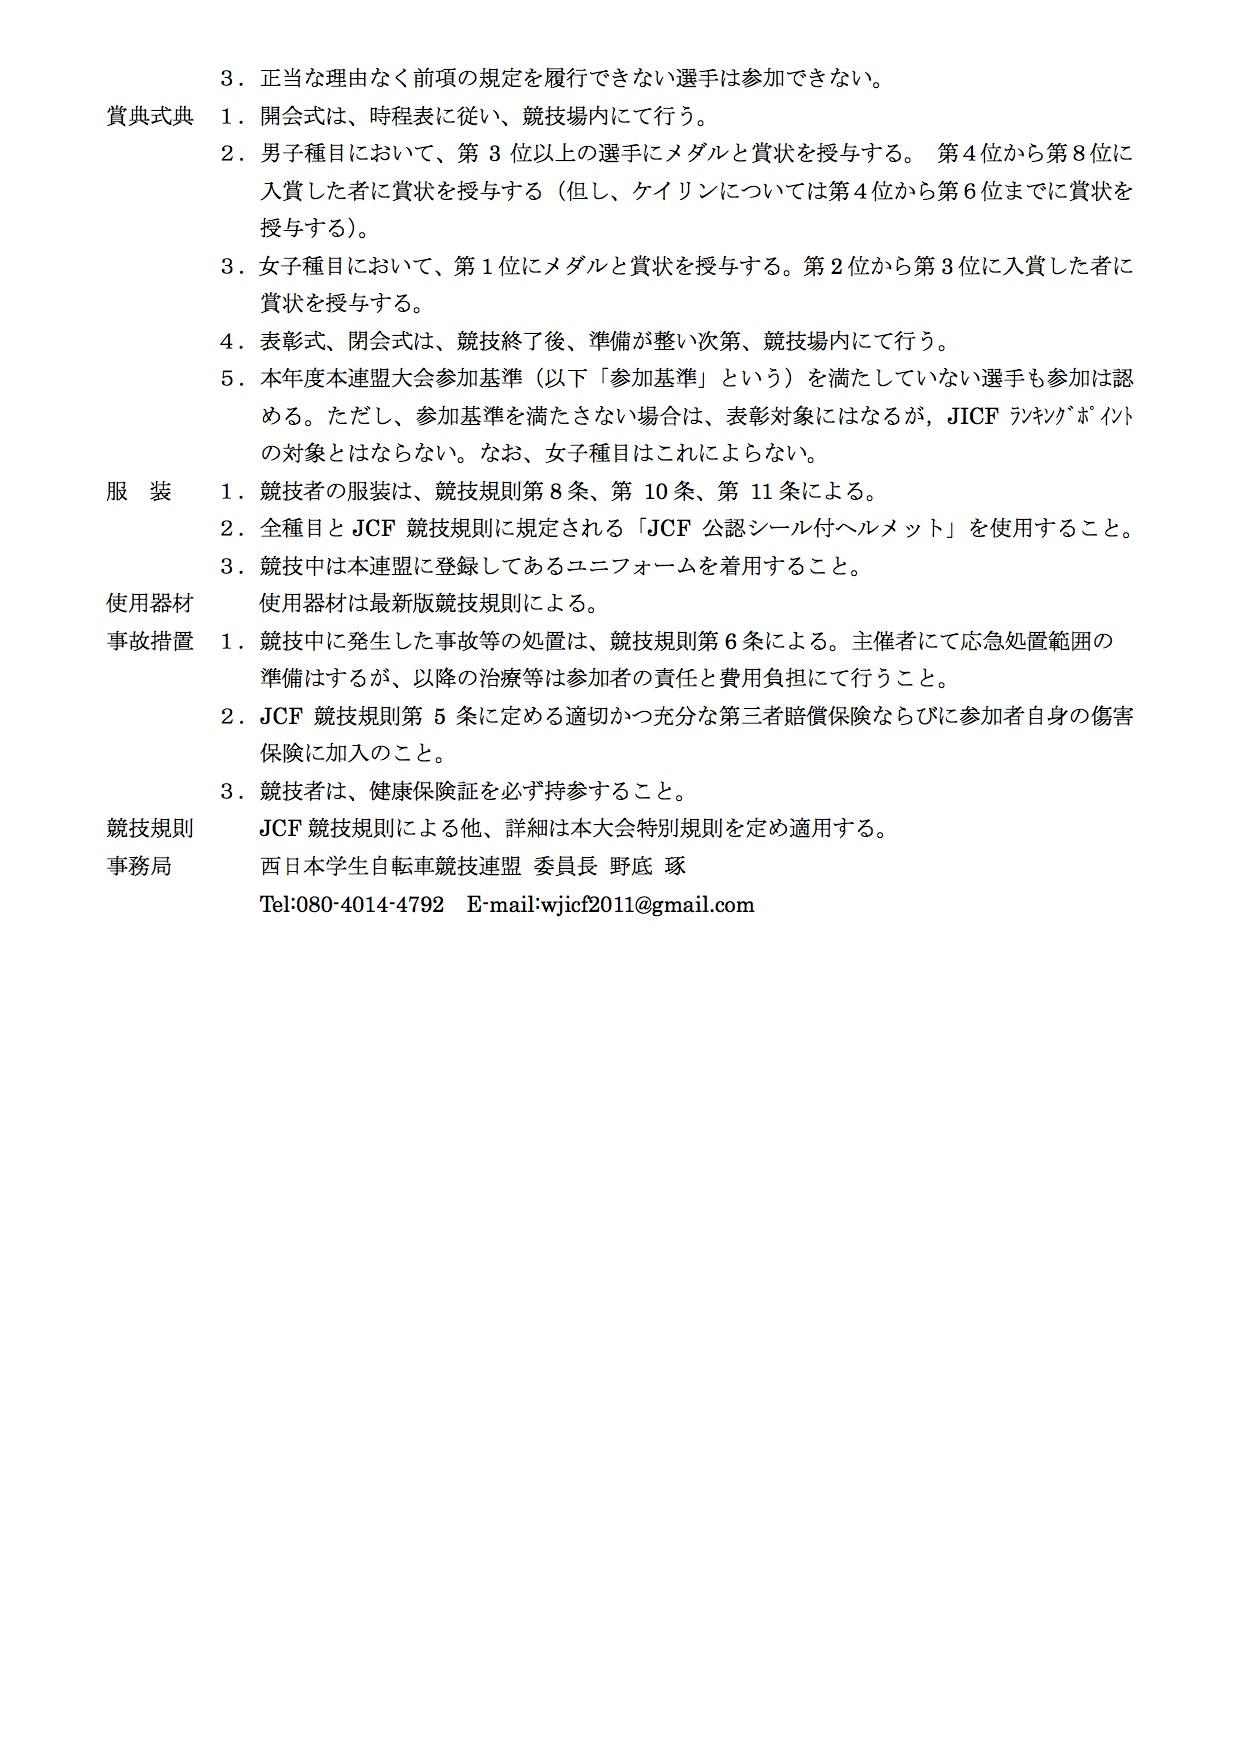 16west_tr_shinjin_yoko_160818_002